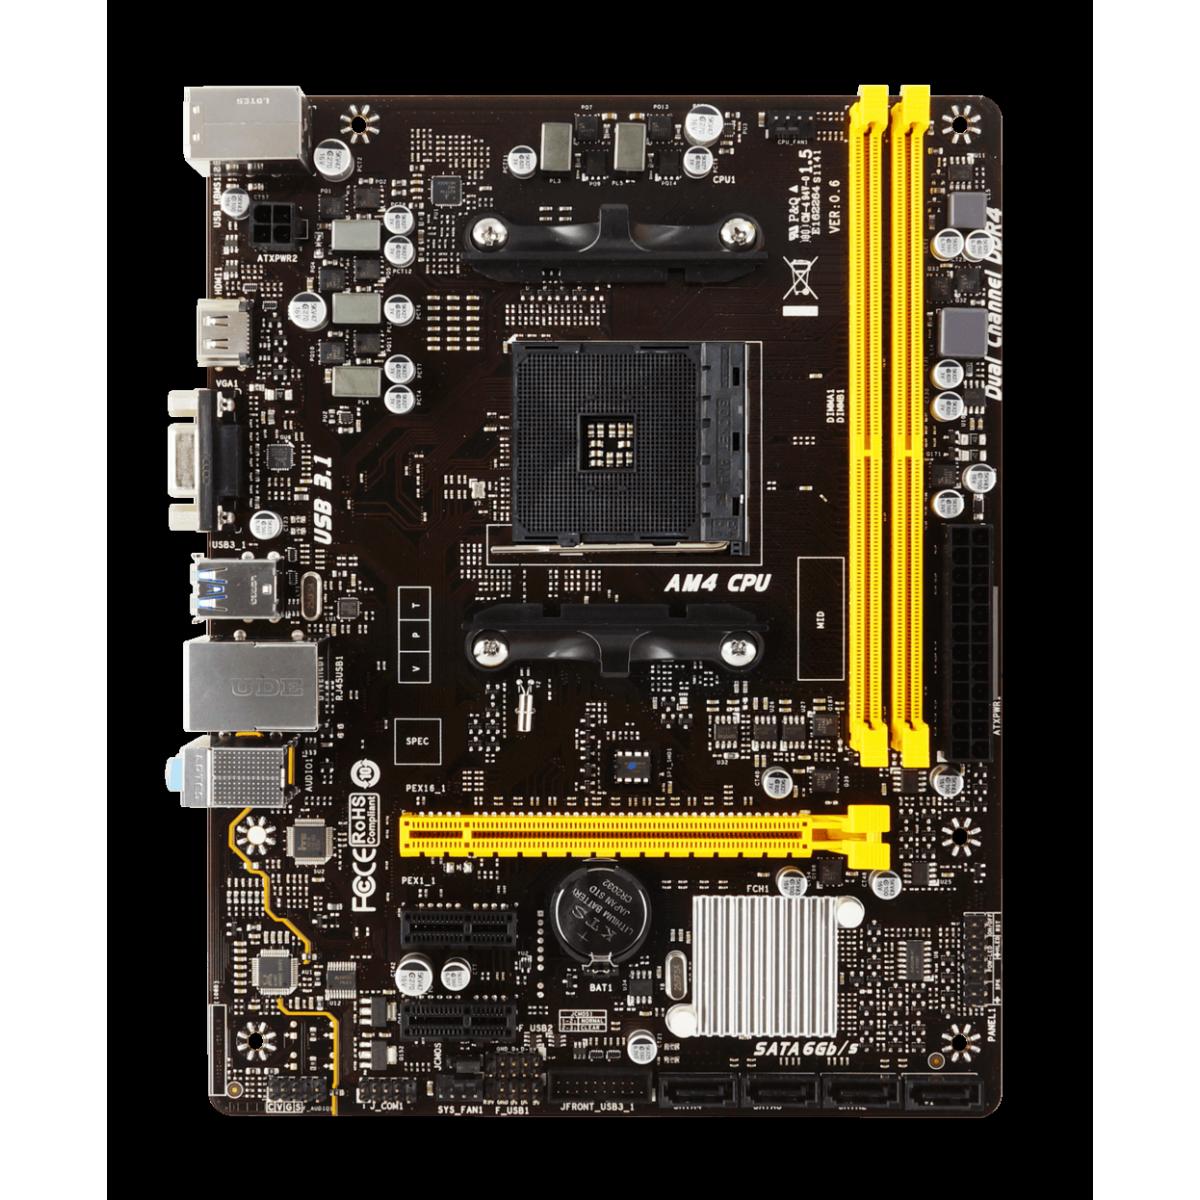 Kit Upgrade Biostar GeForce GT 710 + AMD Ryzen 5 3500 + Biostar A320MH + Memória DDR4 16GB (2x8GB) 3000Mhz